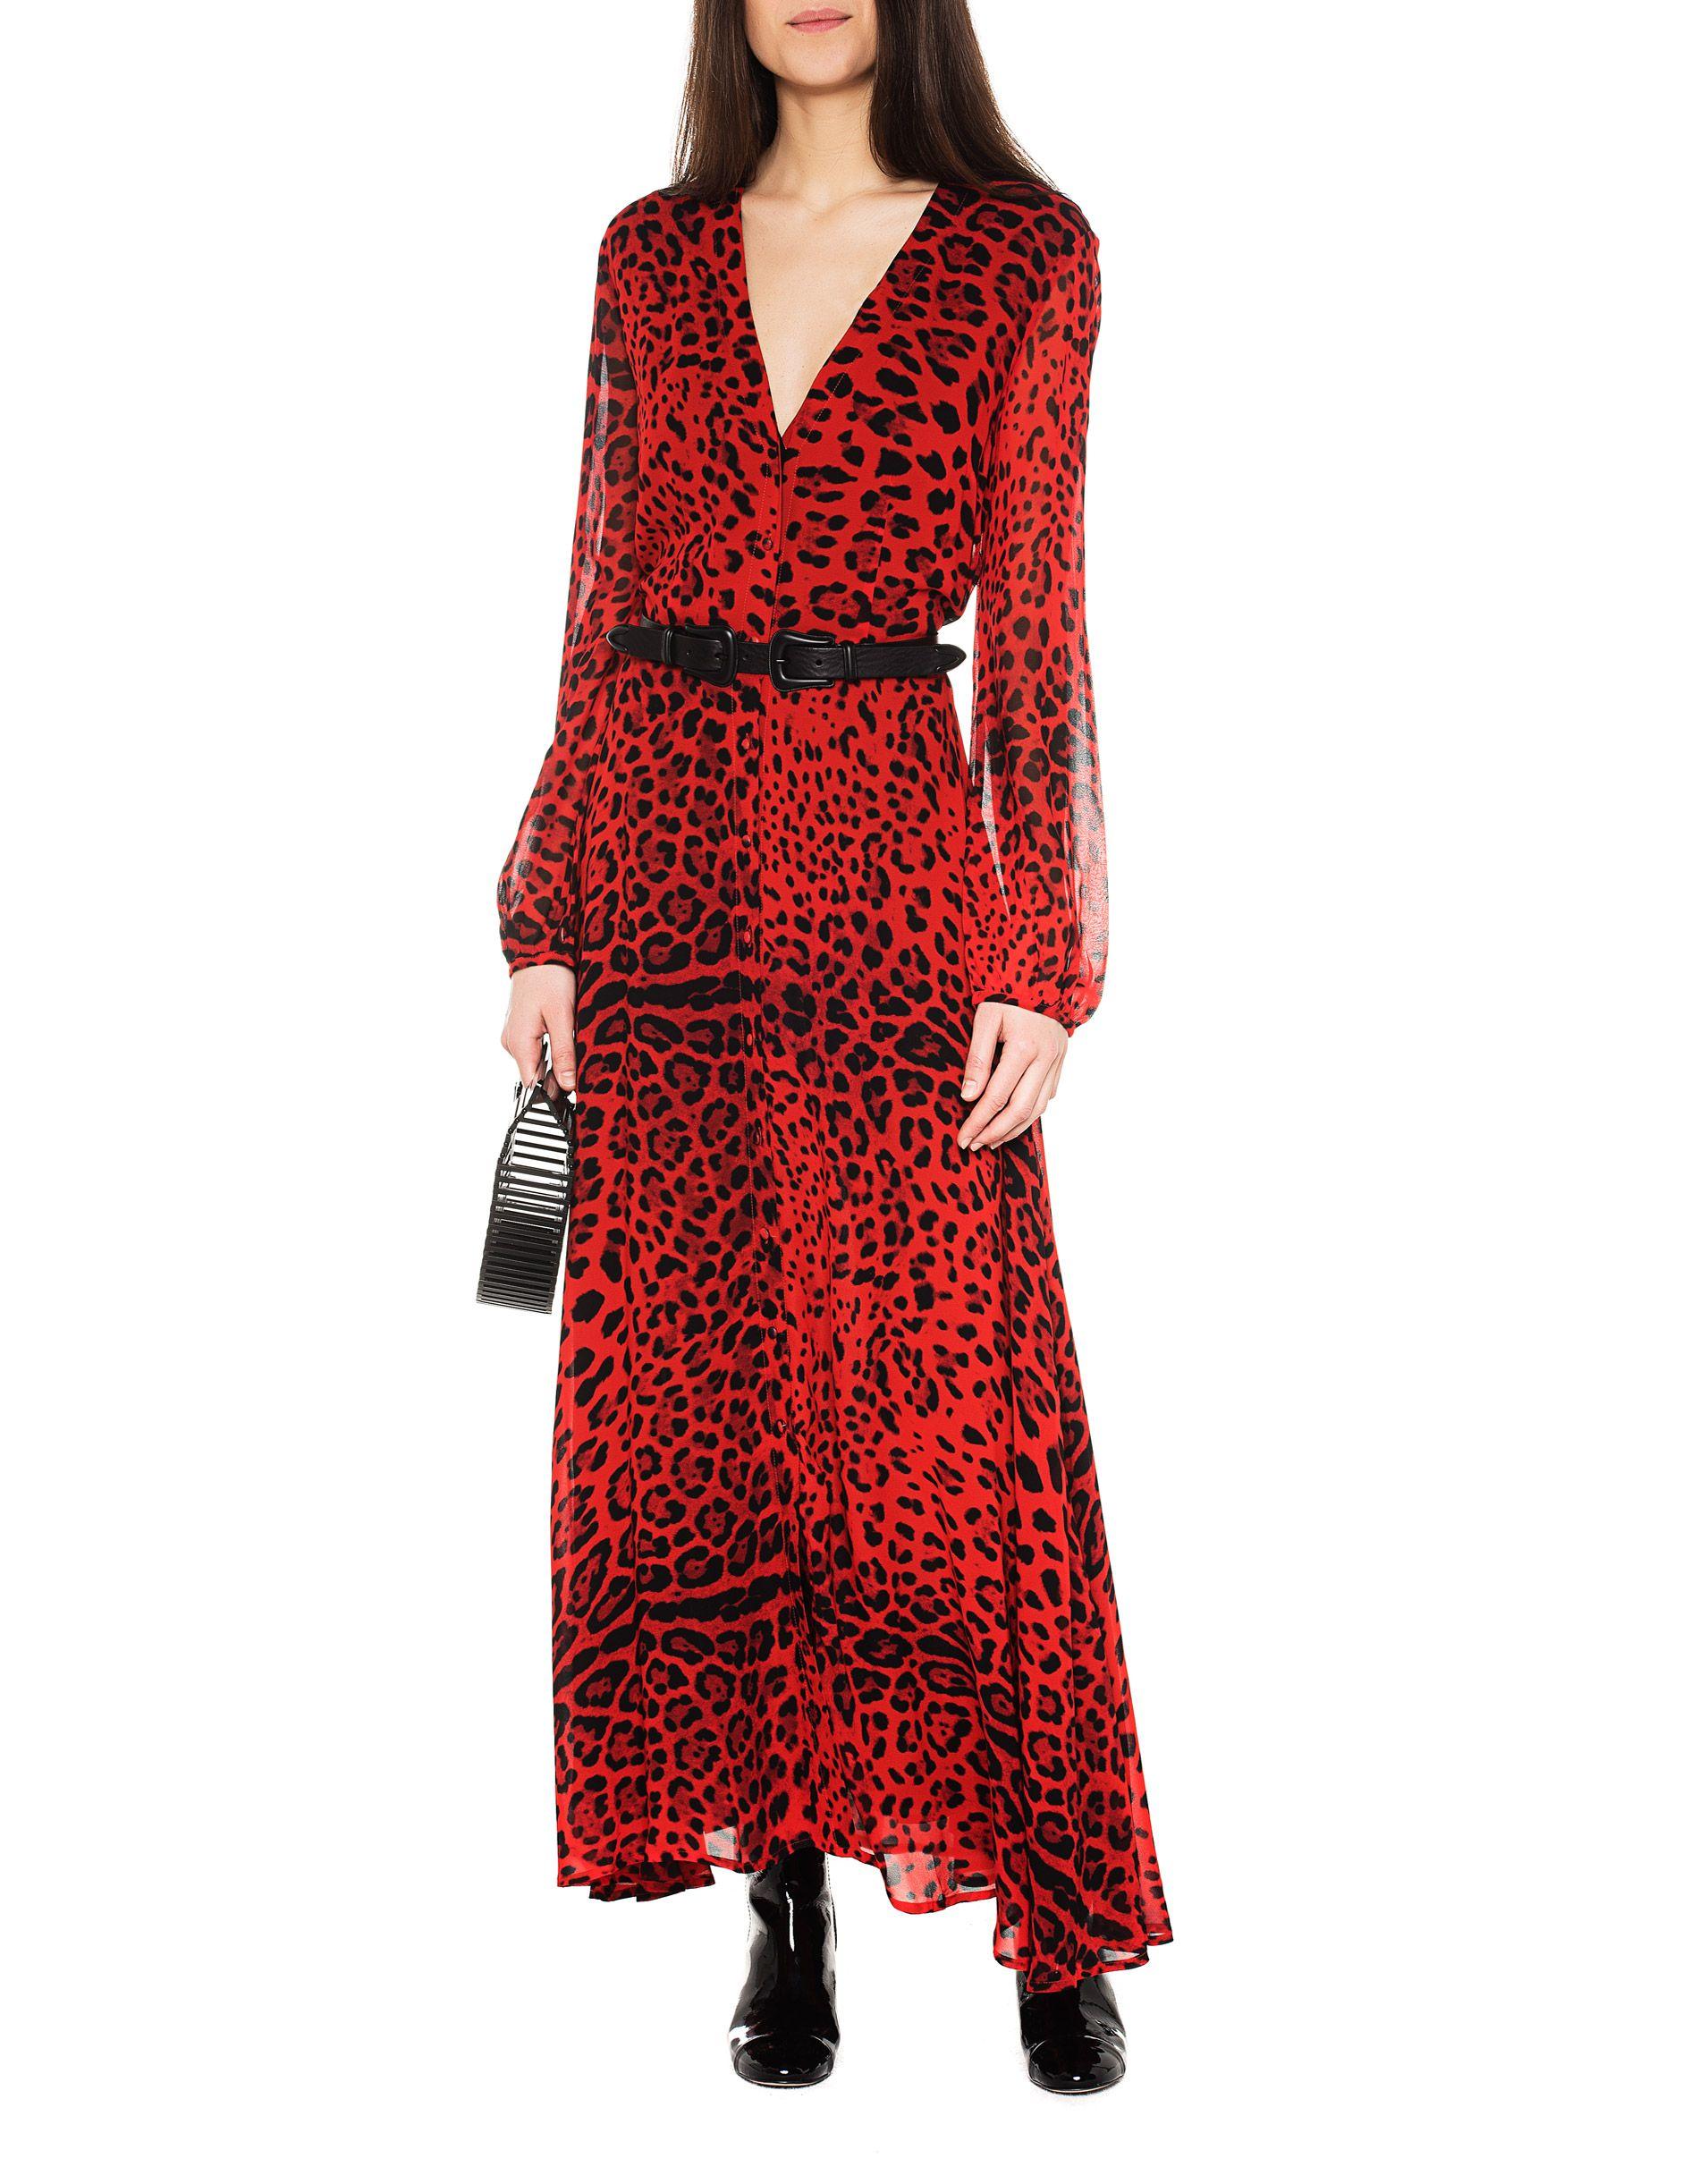 Https Www Jades24 Com De Produkt Women Clothing Woman Dresses Jadicted D Kleid Leo 1 Red Index Html Gclid Eaia Frauen Outfits Rot Anziehen Kleider Fur Frauen